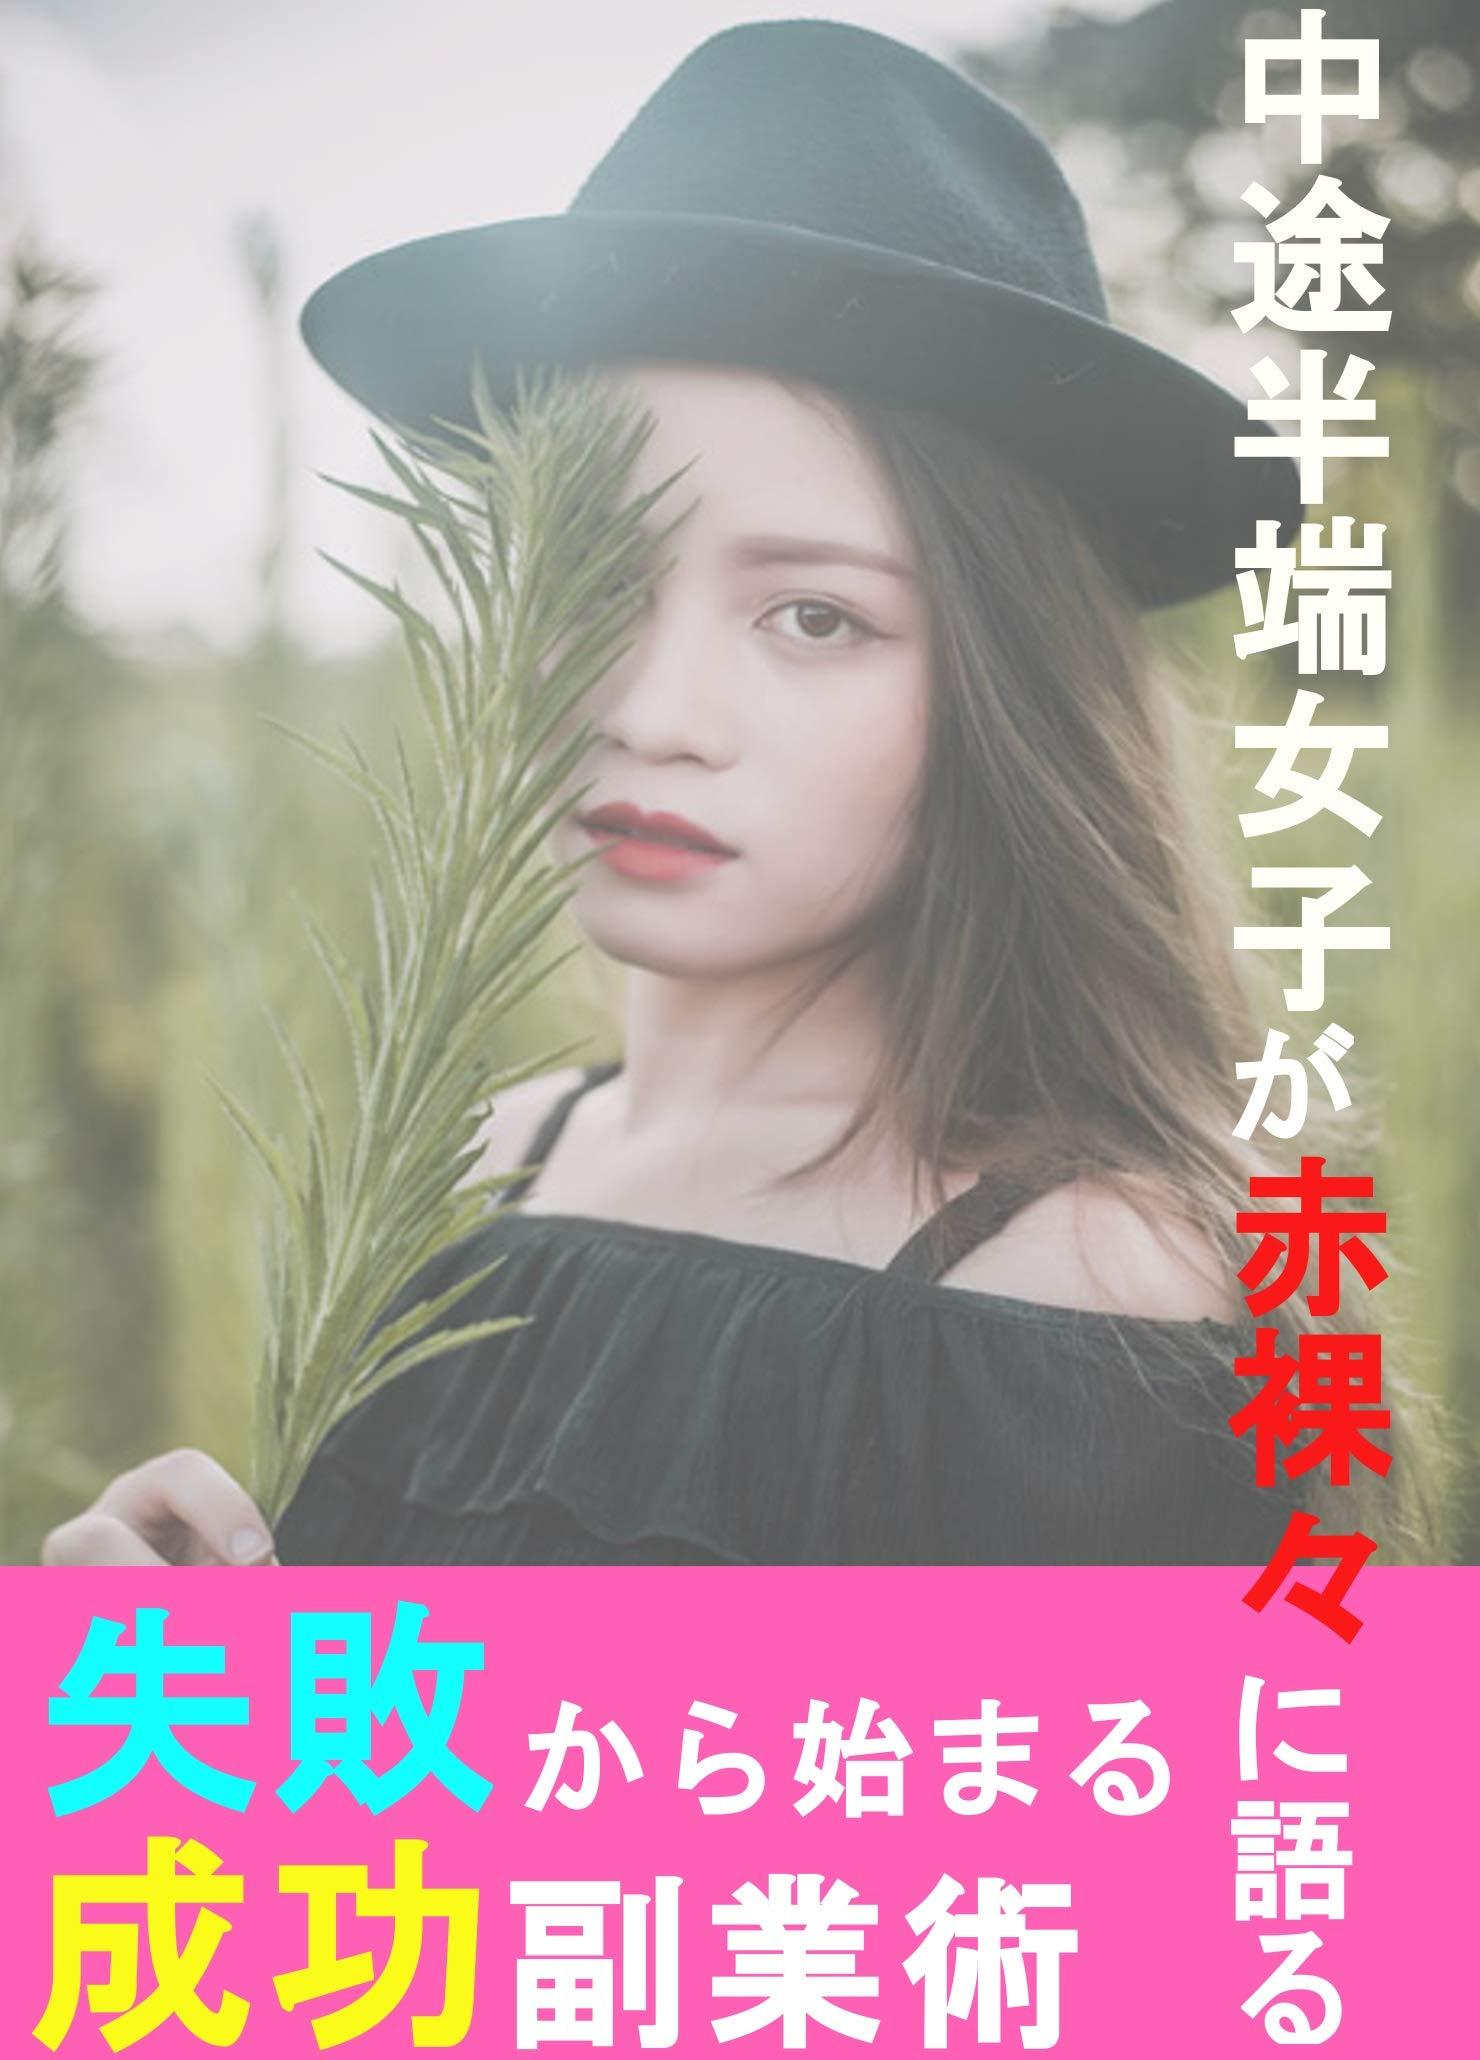 Half-heartedgirlspeaksopenly: Successfulsidebusinessstartingfromfailure (Japanese Edition)